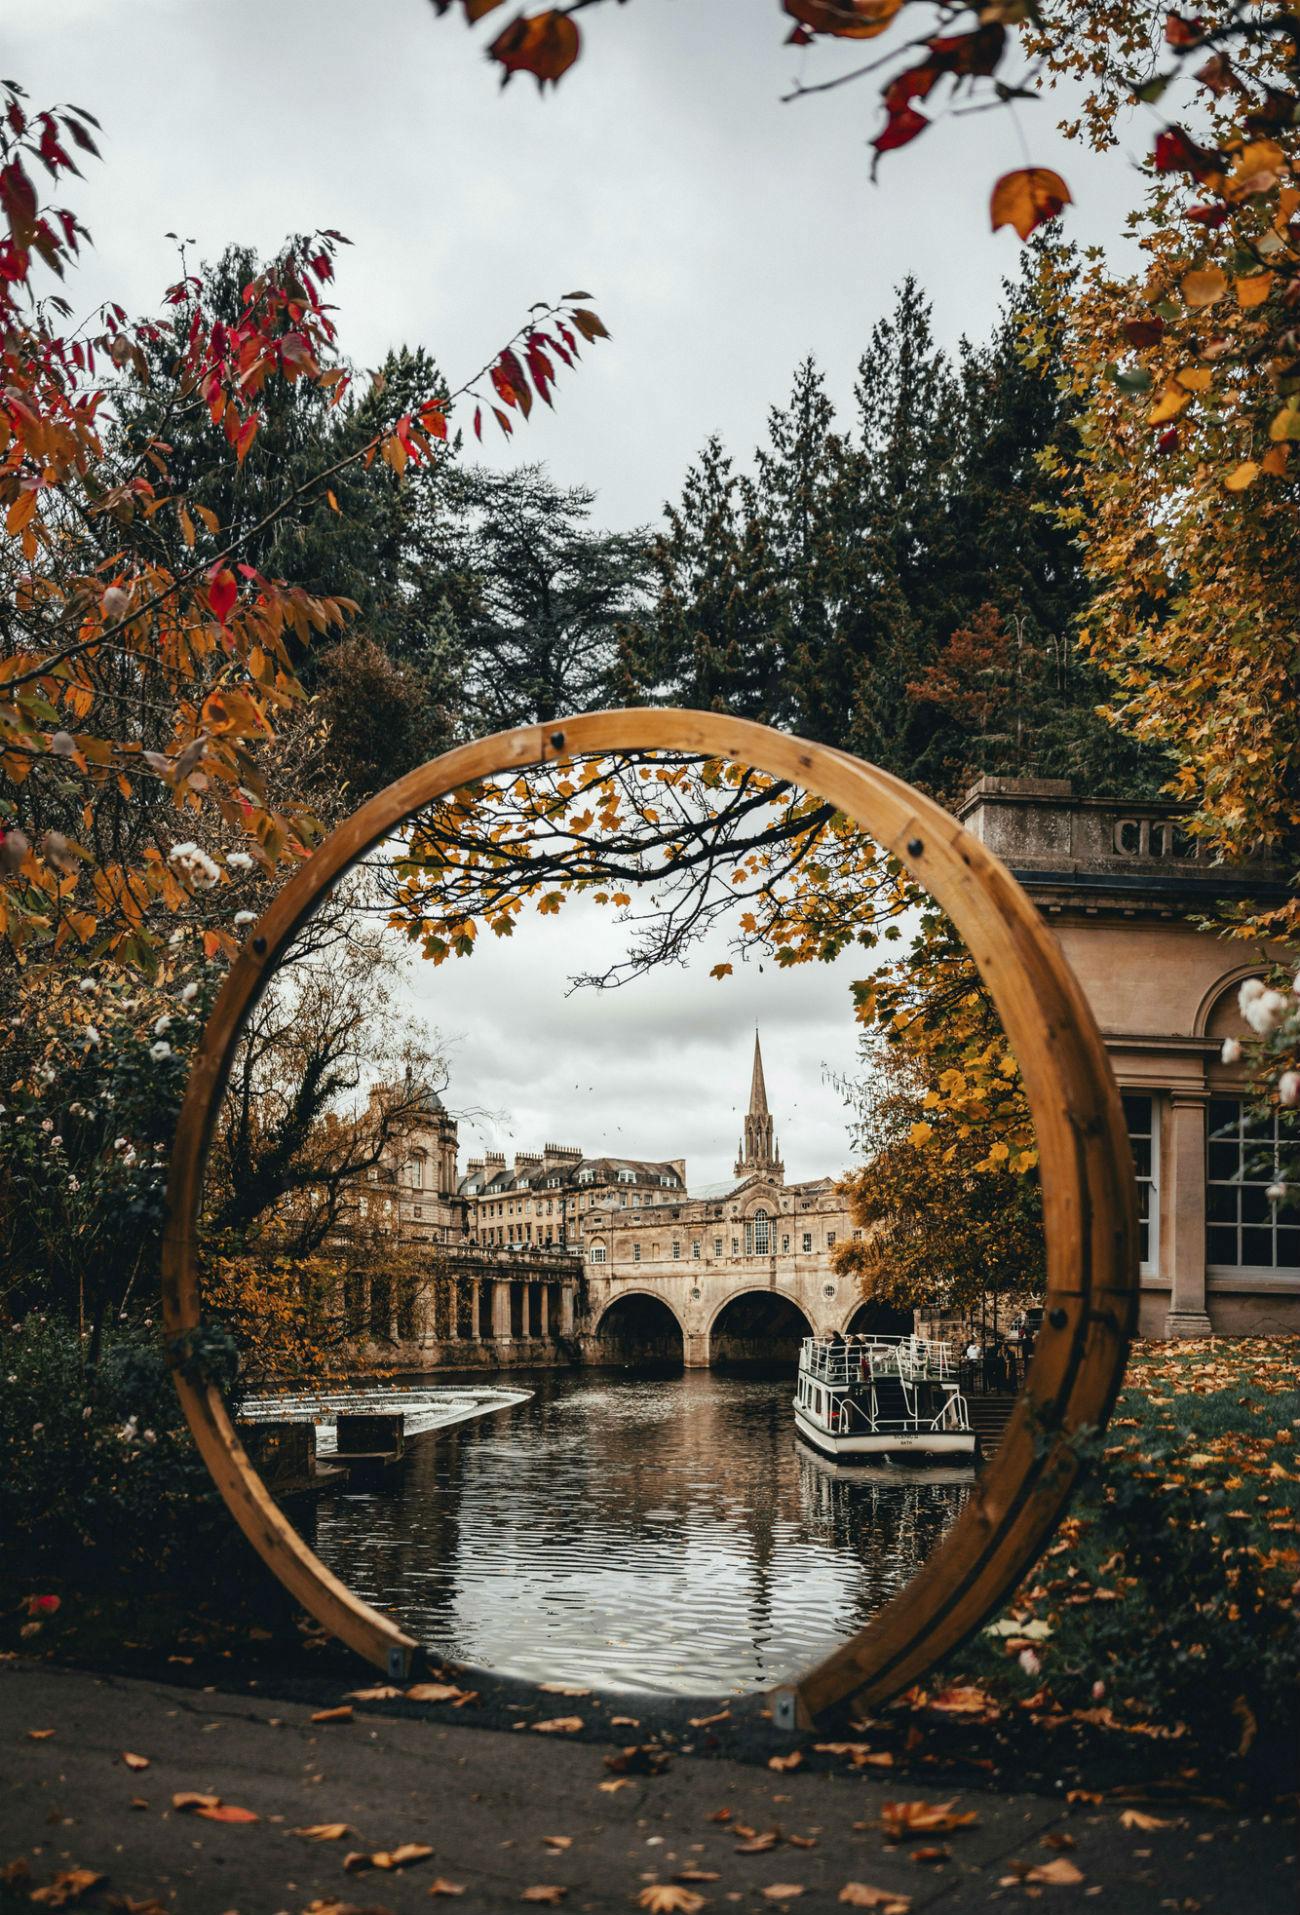 Roman Baths, Bath, England - | Amazing Places